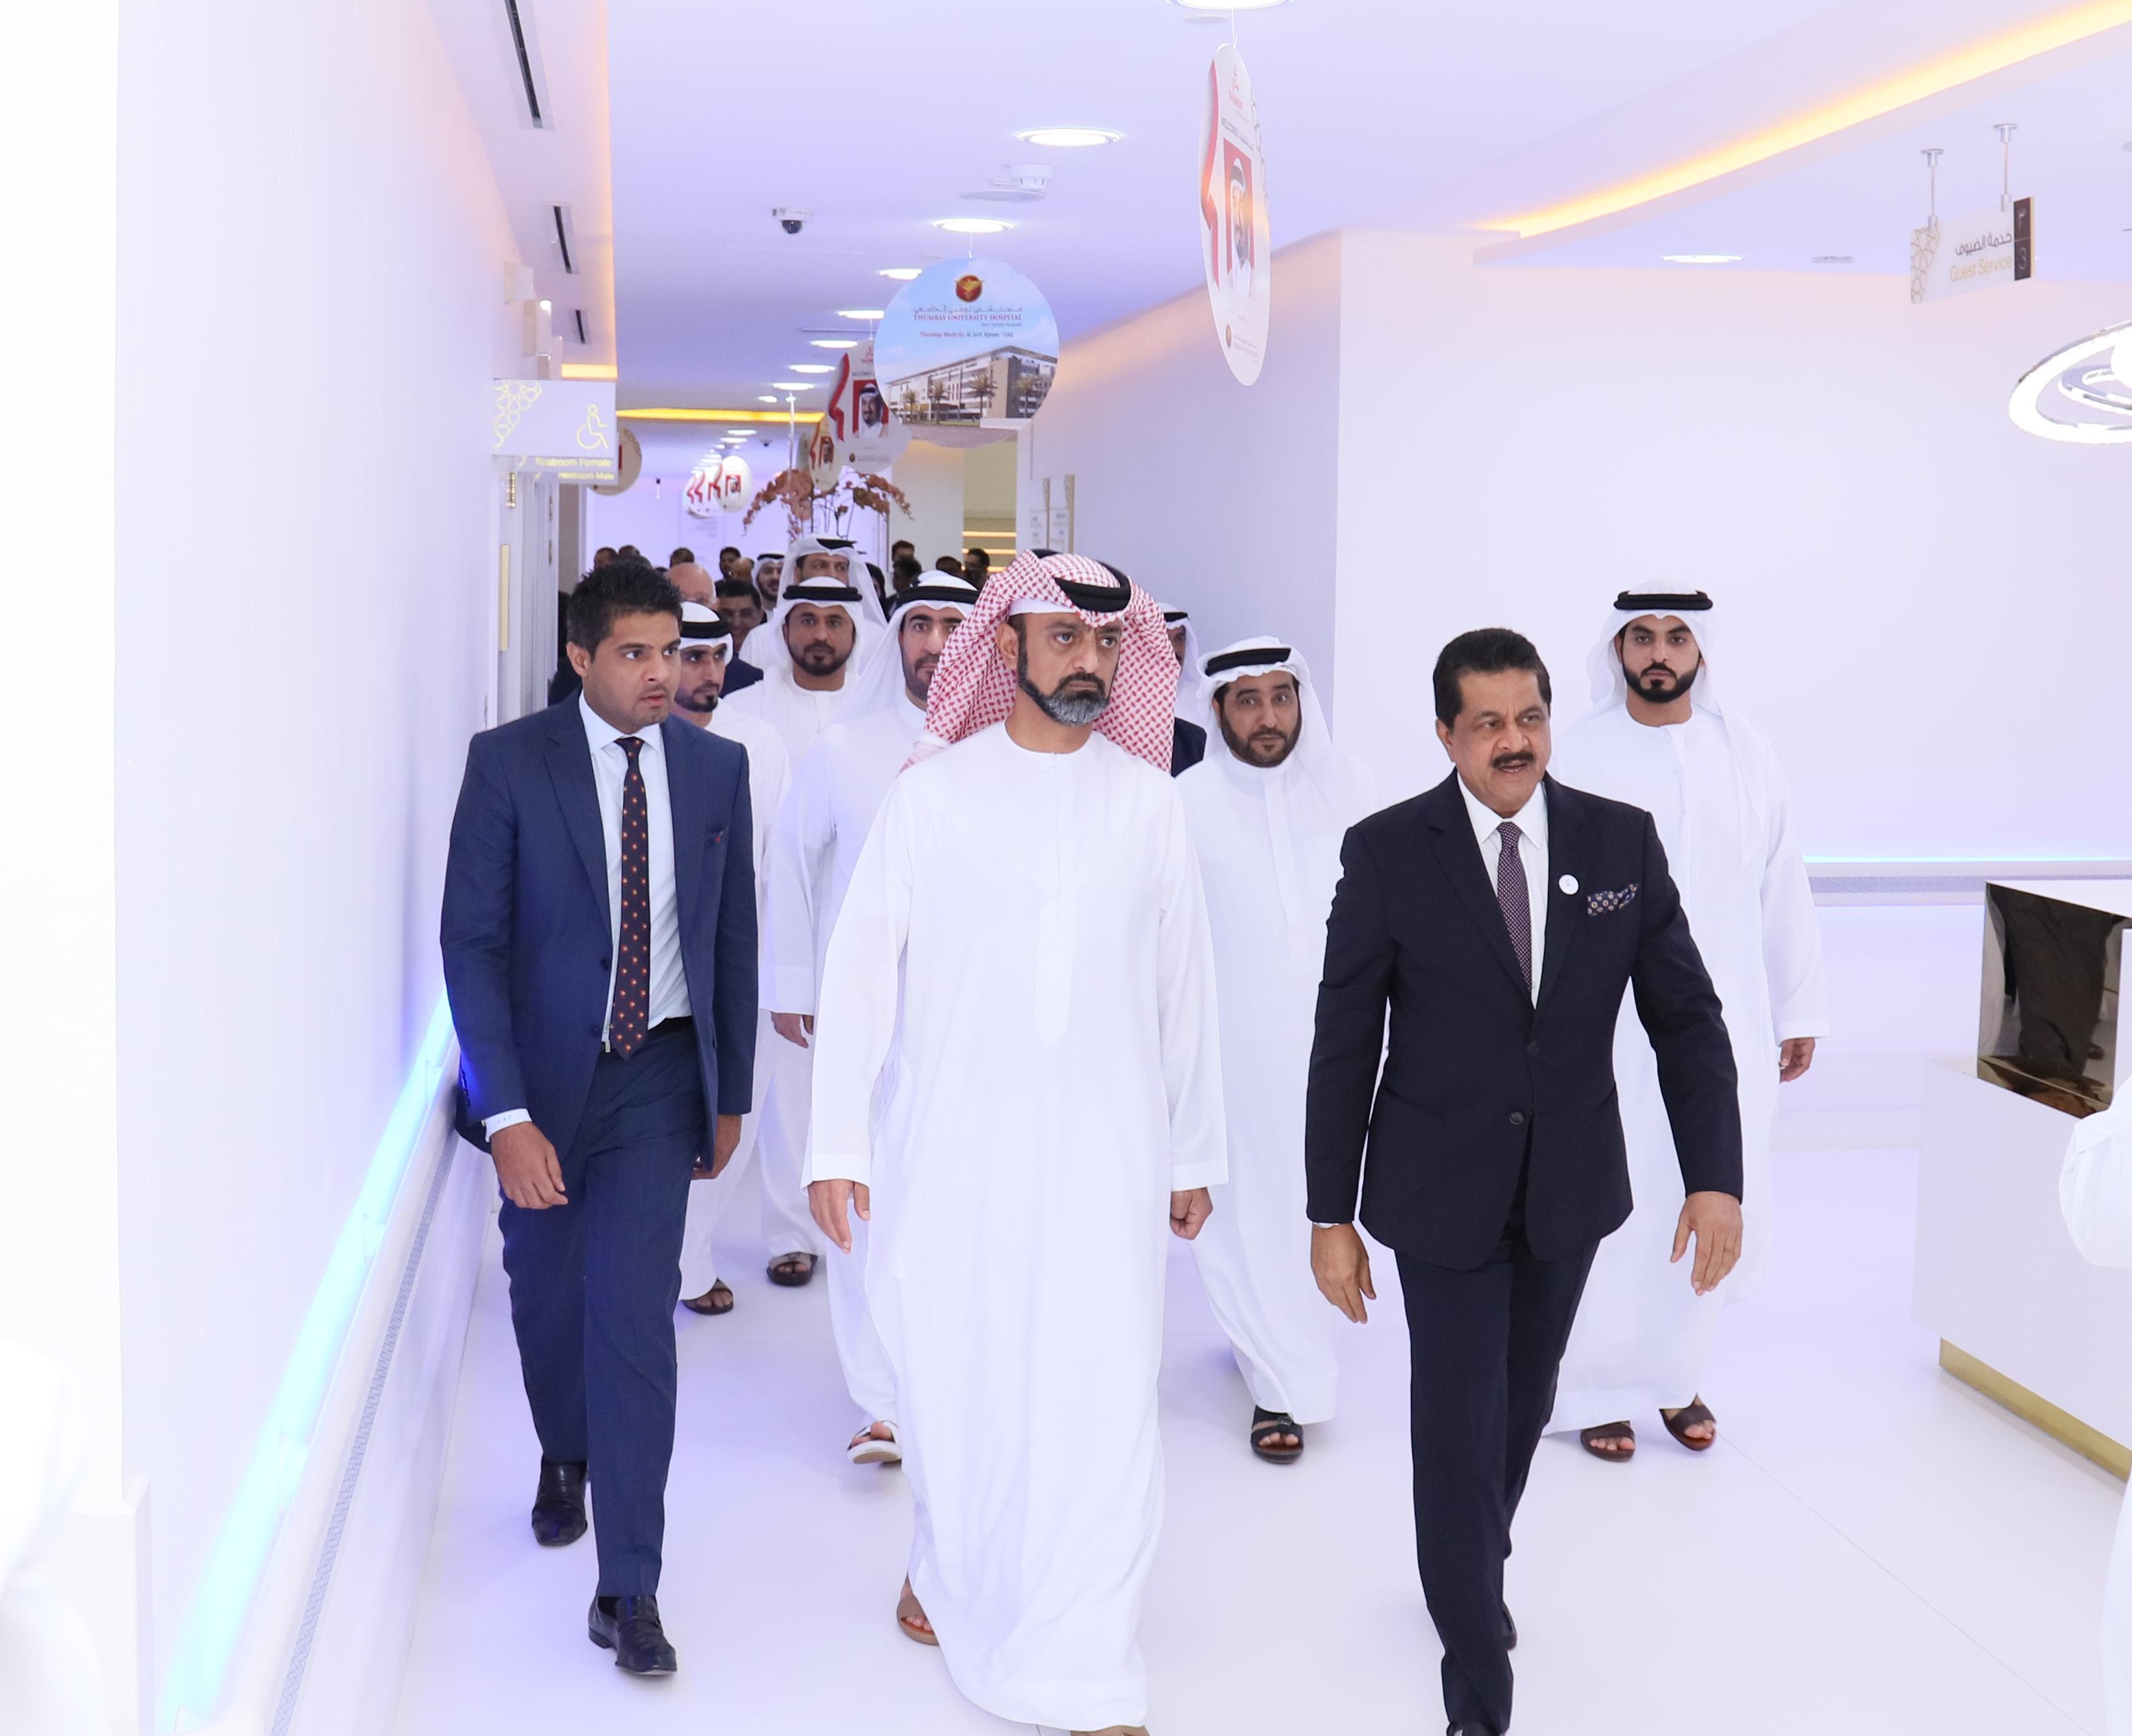 His Highness Sheikh Ammar bin Humaid Al Nuaimi Inaugurates Thumbay University Hospital at Thumbay Medicity Ajman